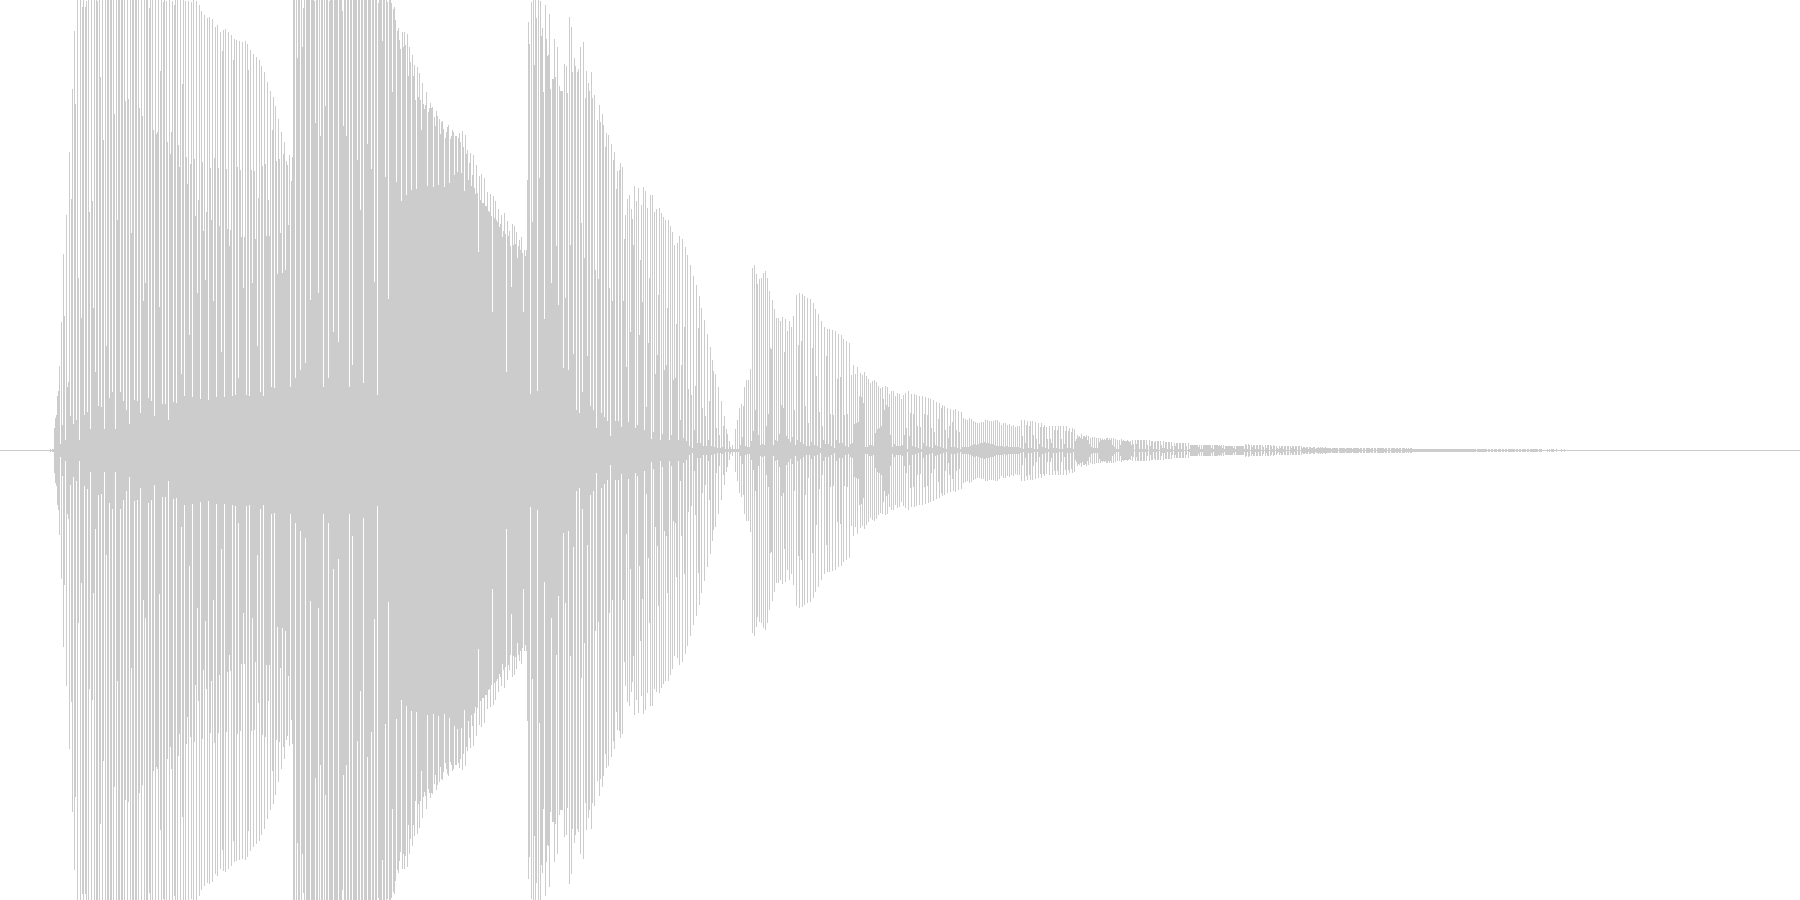 8bit音源による魔法1の未再生の波形